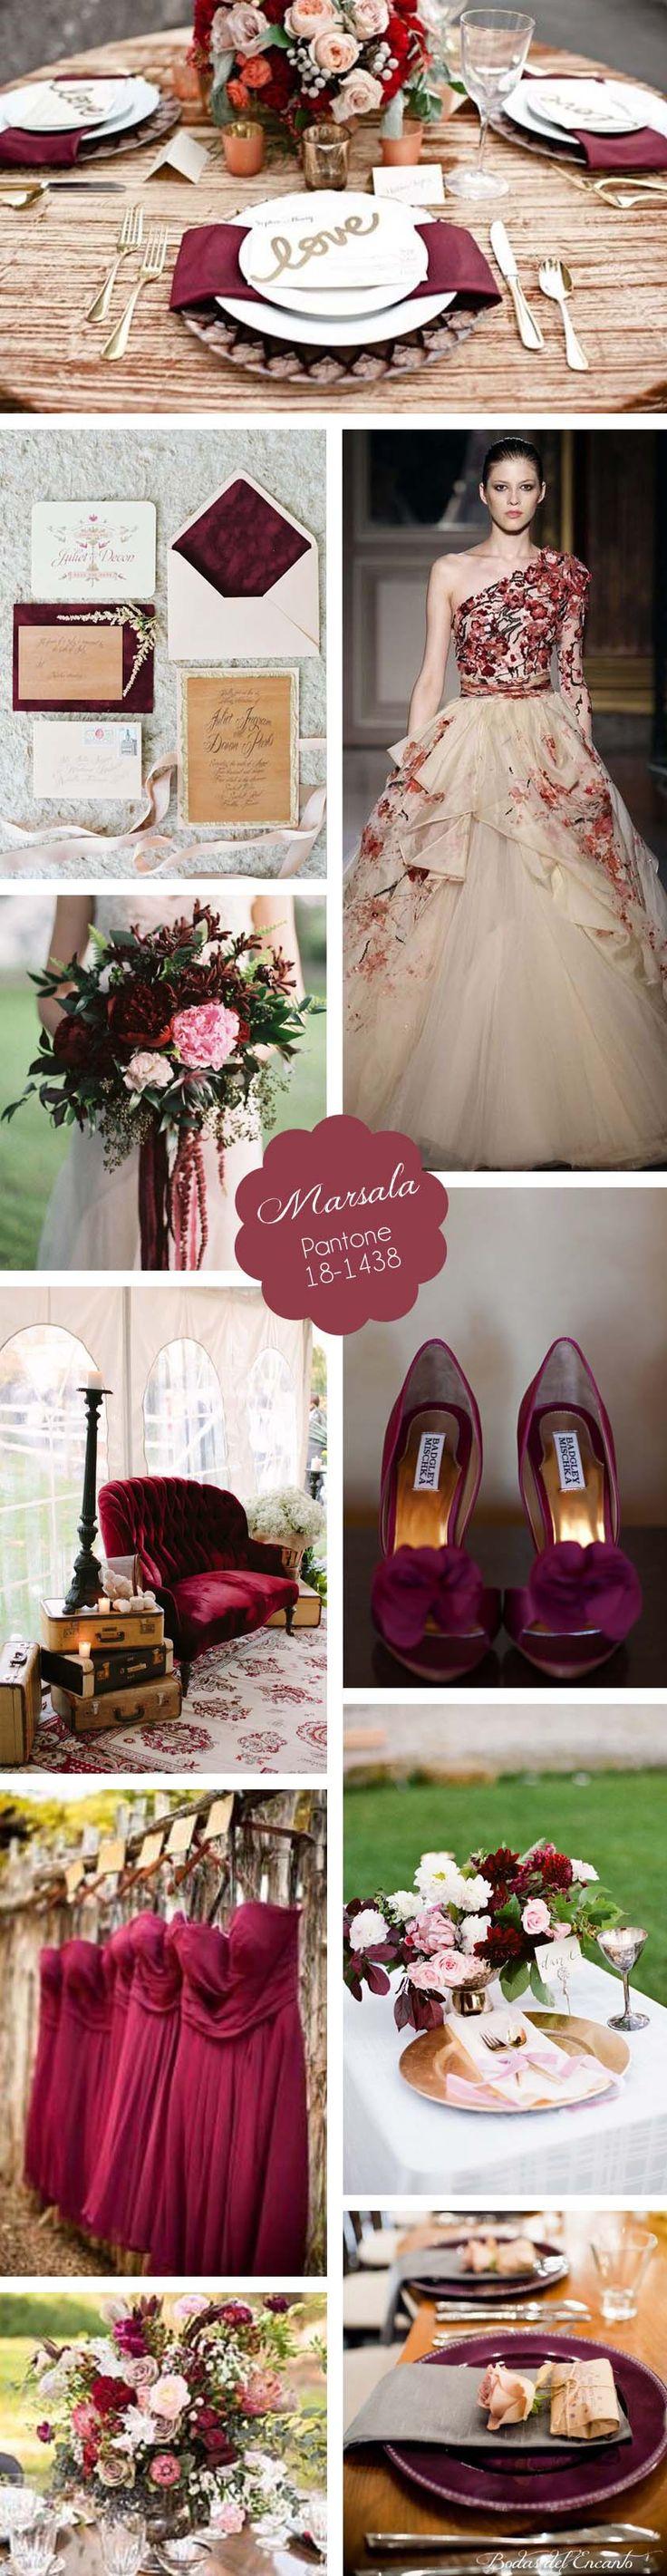 Marsala Wedding Inspiration Board #marsala #coloroftheyear2015 #coloroftheyear